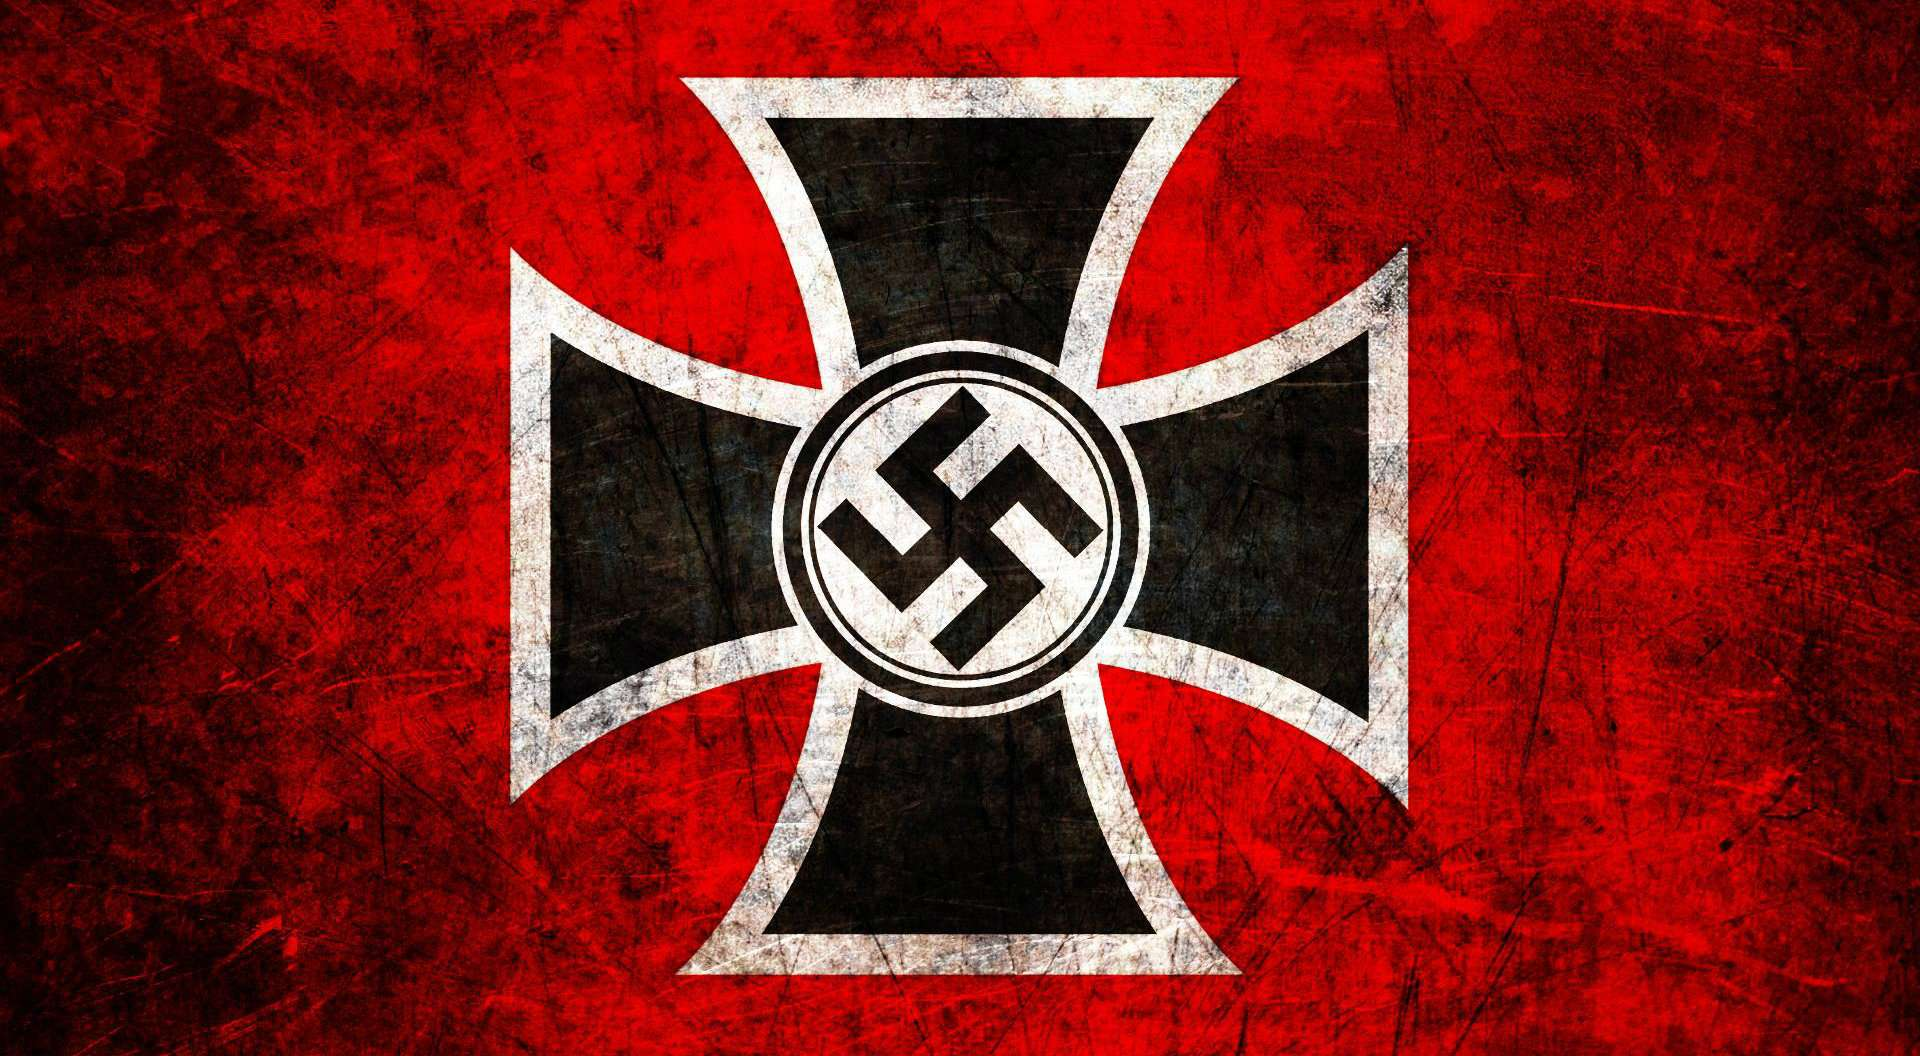 Khidr swastika of hindu created by al khidr xetkbdic8sxxh0gfown0xw3lvj9vzafzcjylimi biocorpaavc